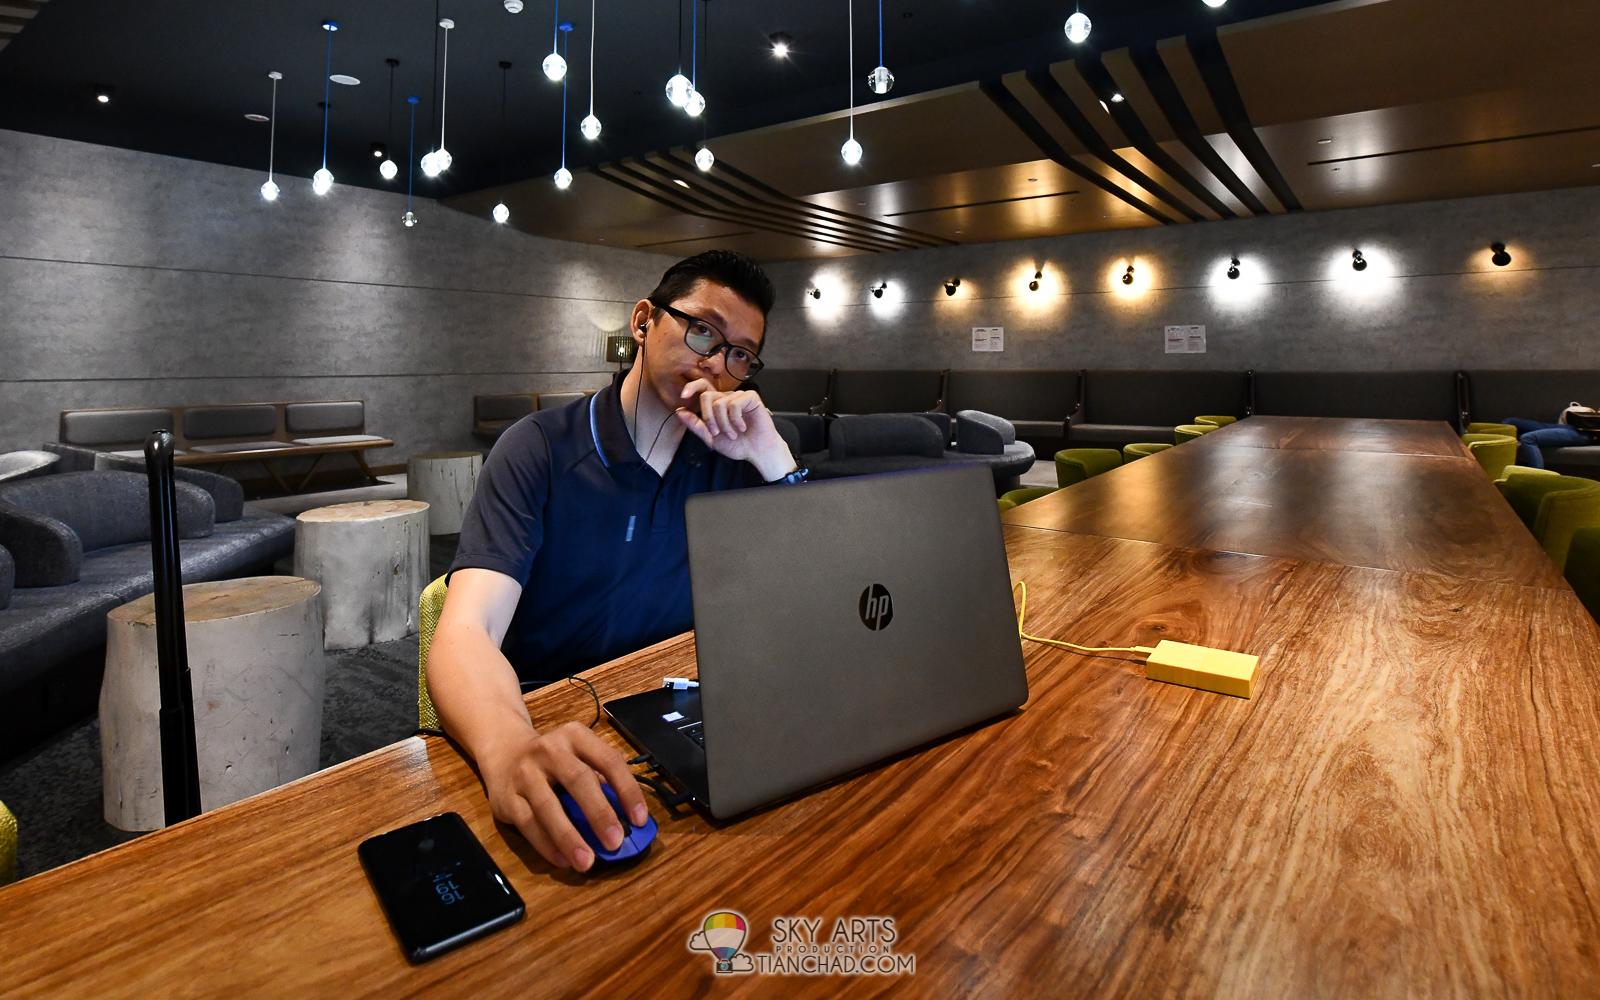 Jom Beria Beraya Win Vespa When You Buy New Laptop Camera Circuit Board Promotiononline Shopping For Promotional